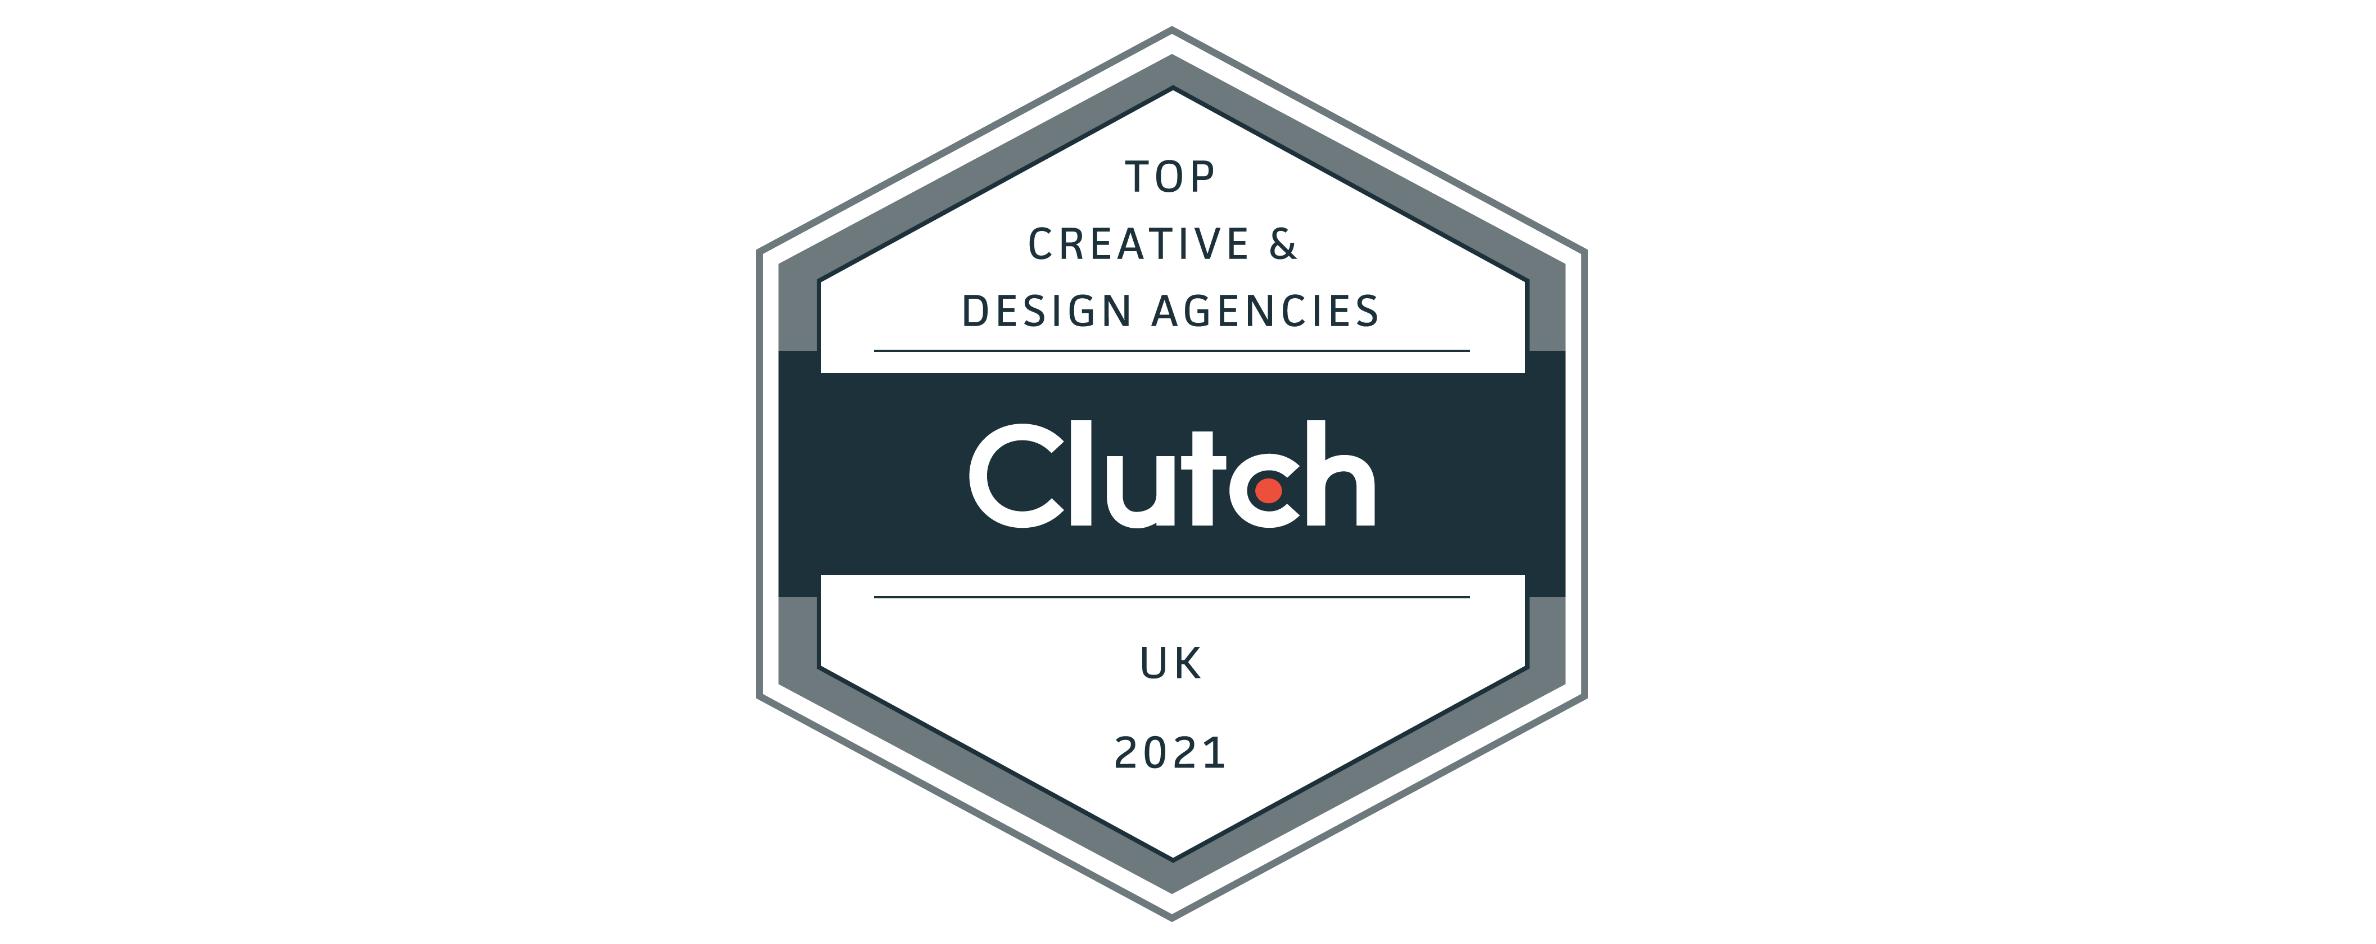 Clutch Video Production Company Award